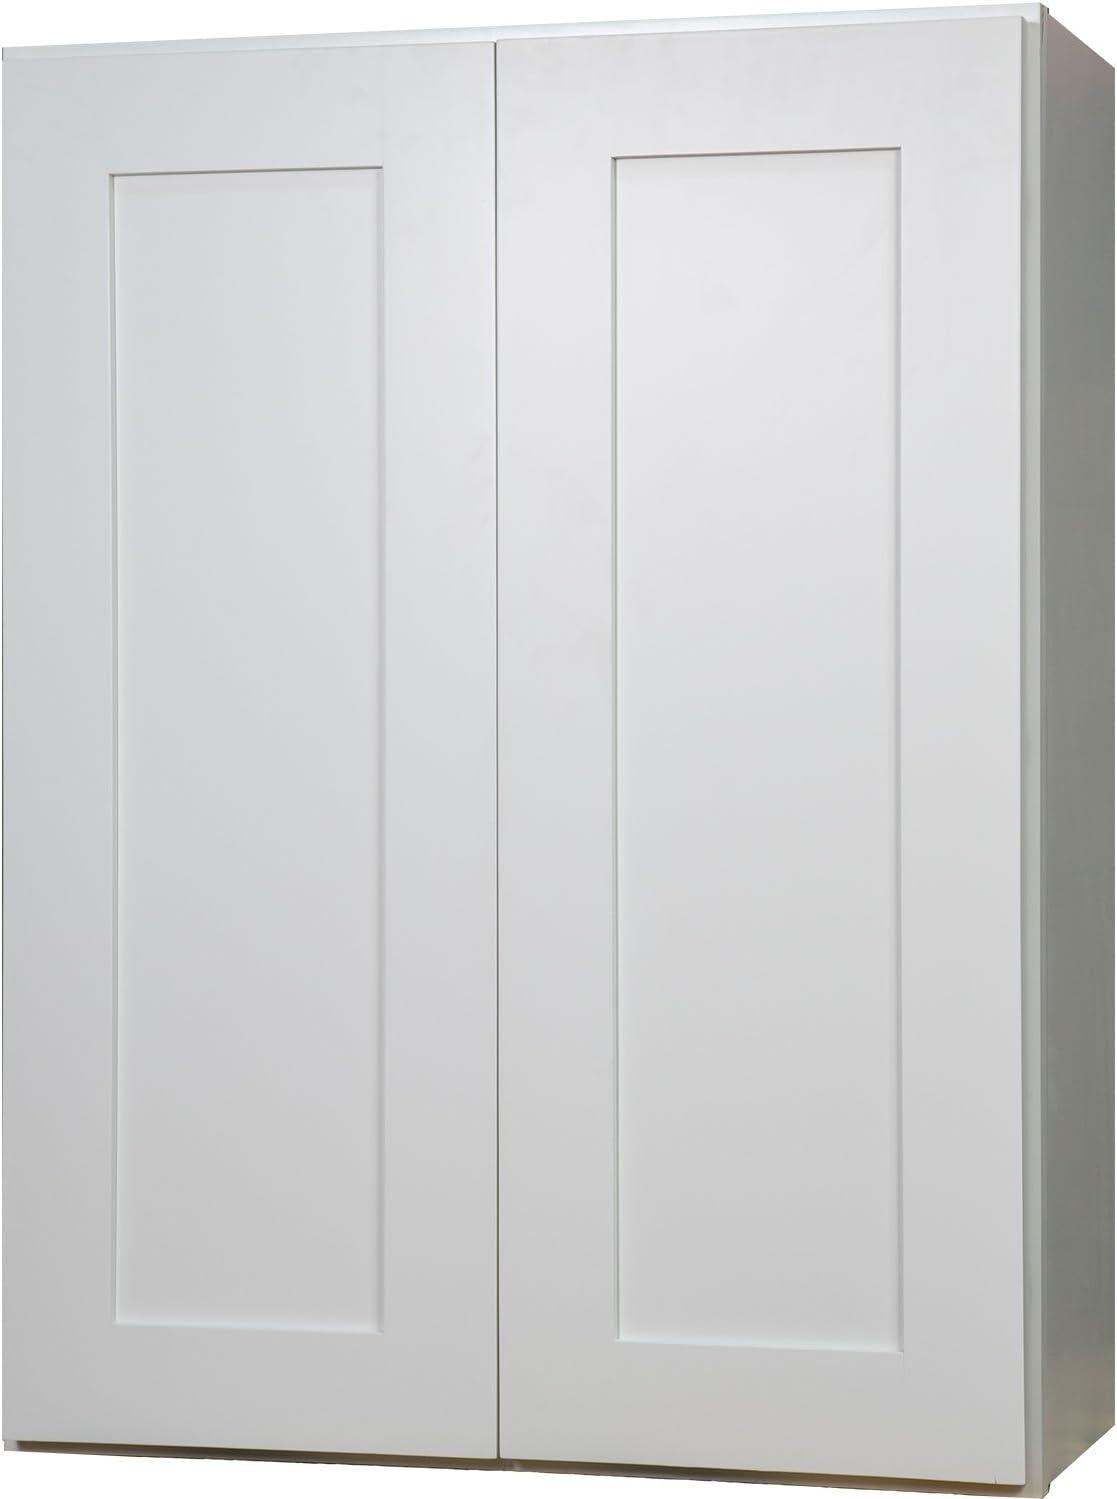 Amazon Com Everyday Cabinets 27 Inch Double Door Wall